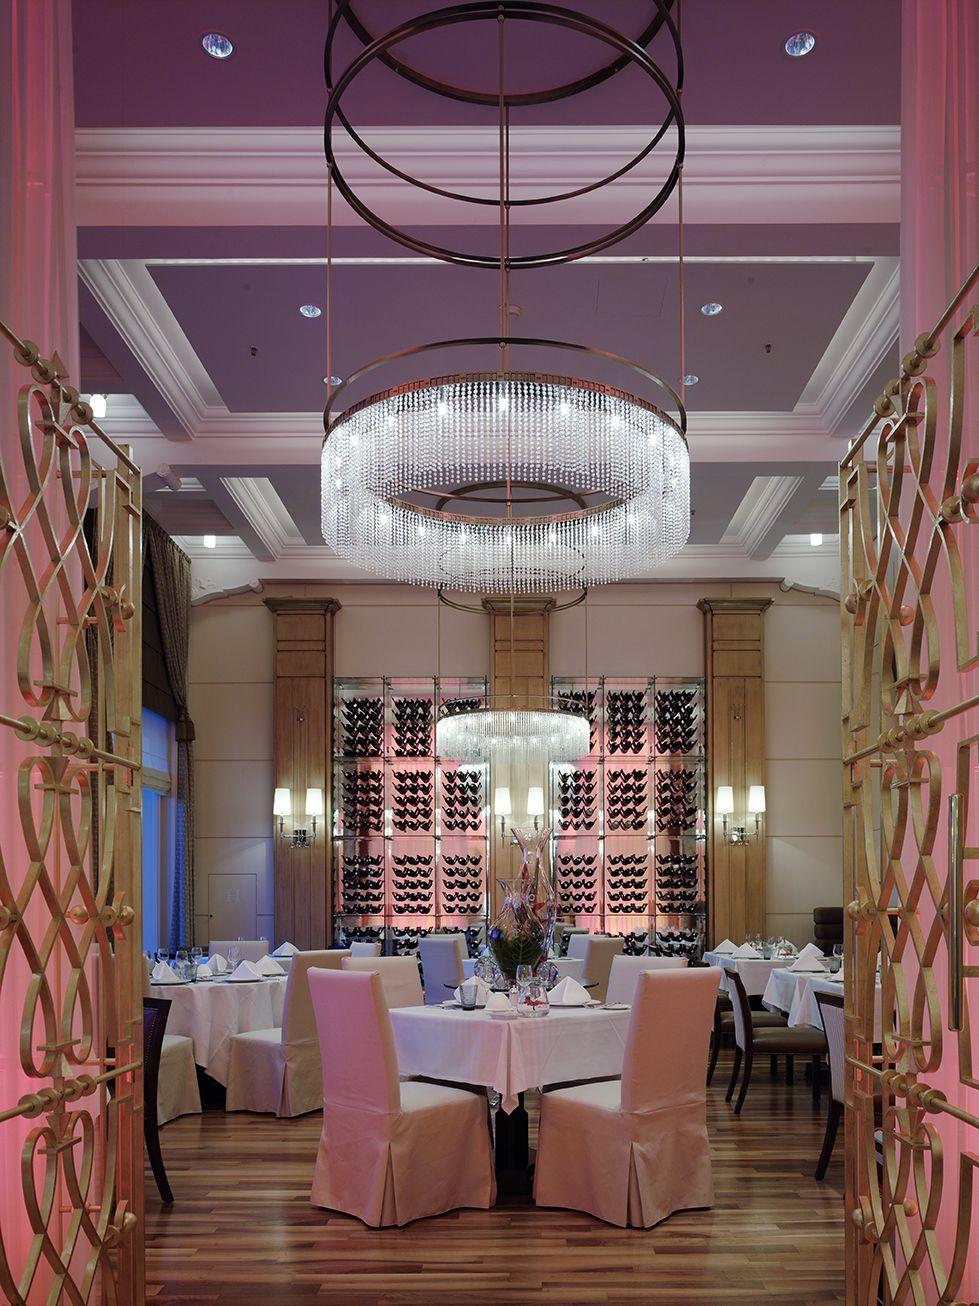 Esplanade Zagreb Hotel Zinfandel S Restaurant Detail Kongres Europe Events And Meetings Industry Magazine